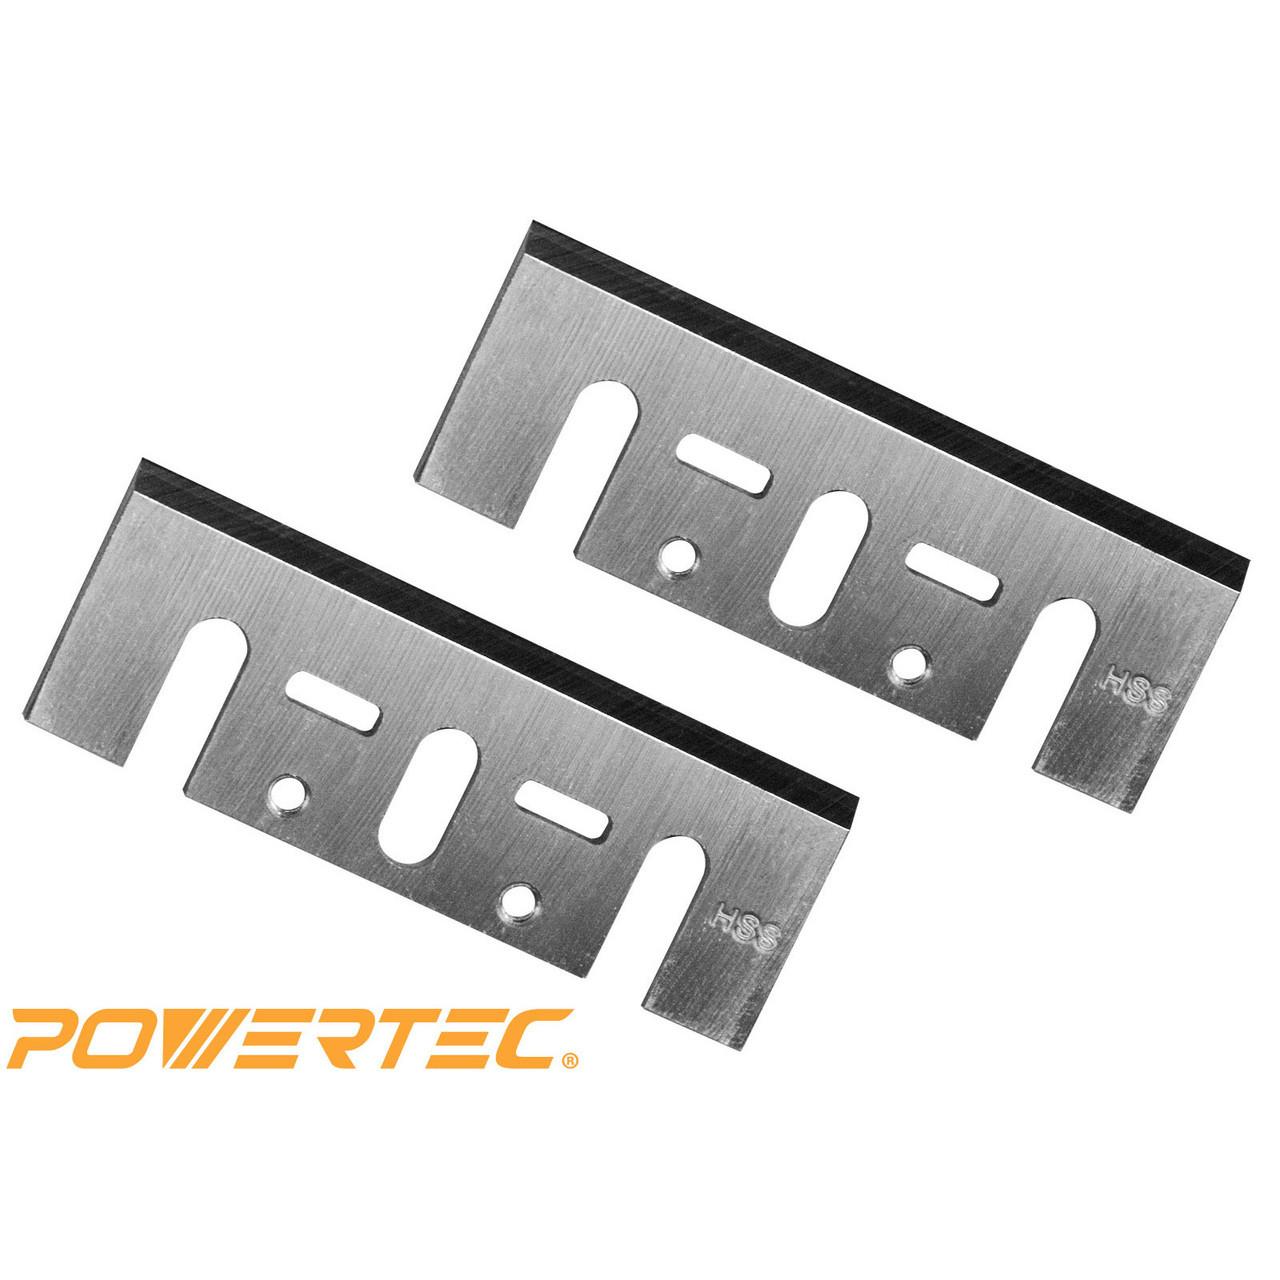 POWERTEC 128361 4-3//8-Inch HSS Planer Blades for Makita 1912B and 1805B Set of 2